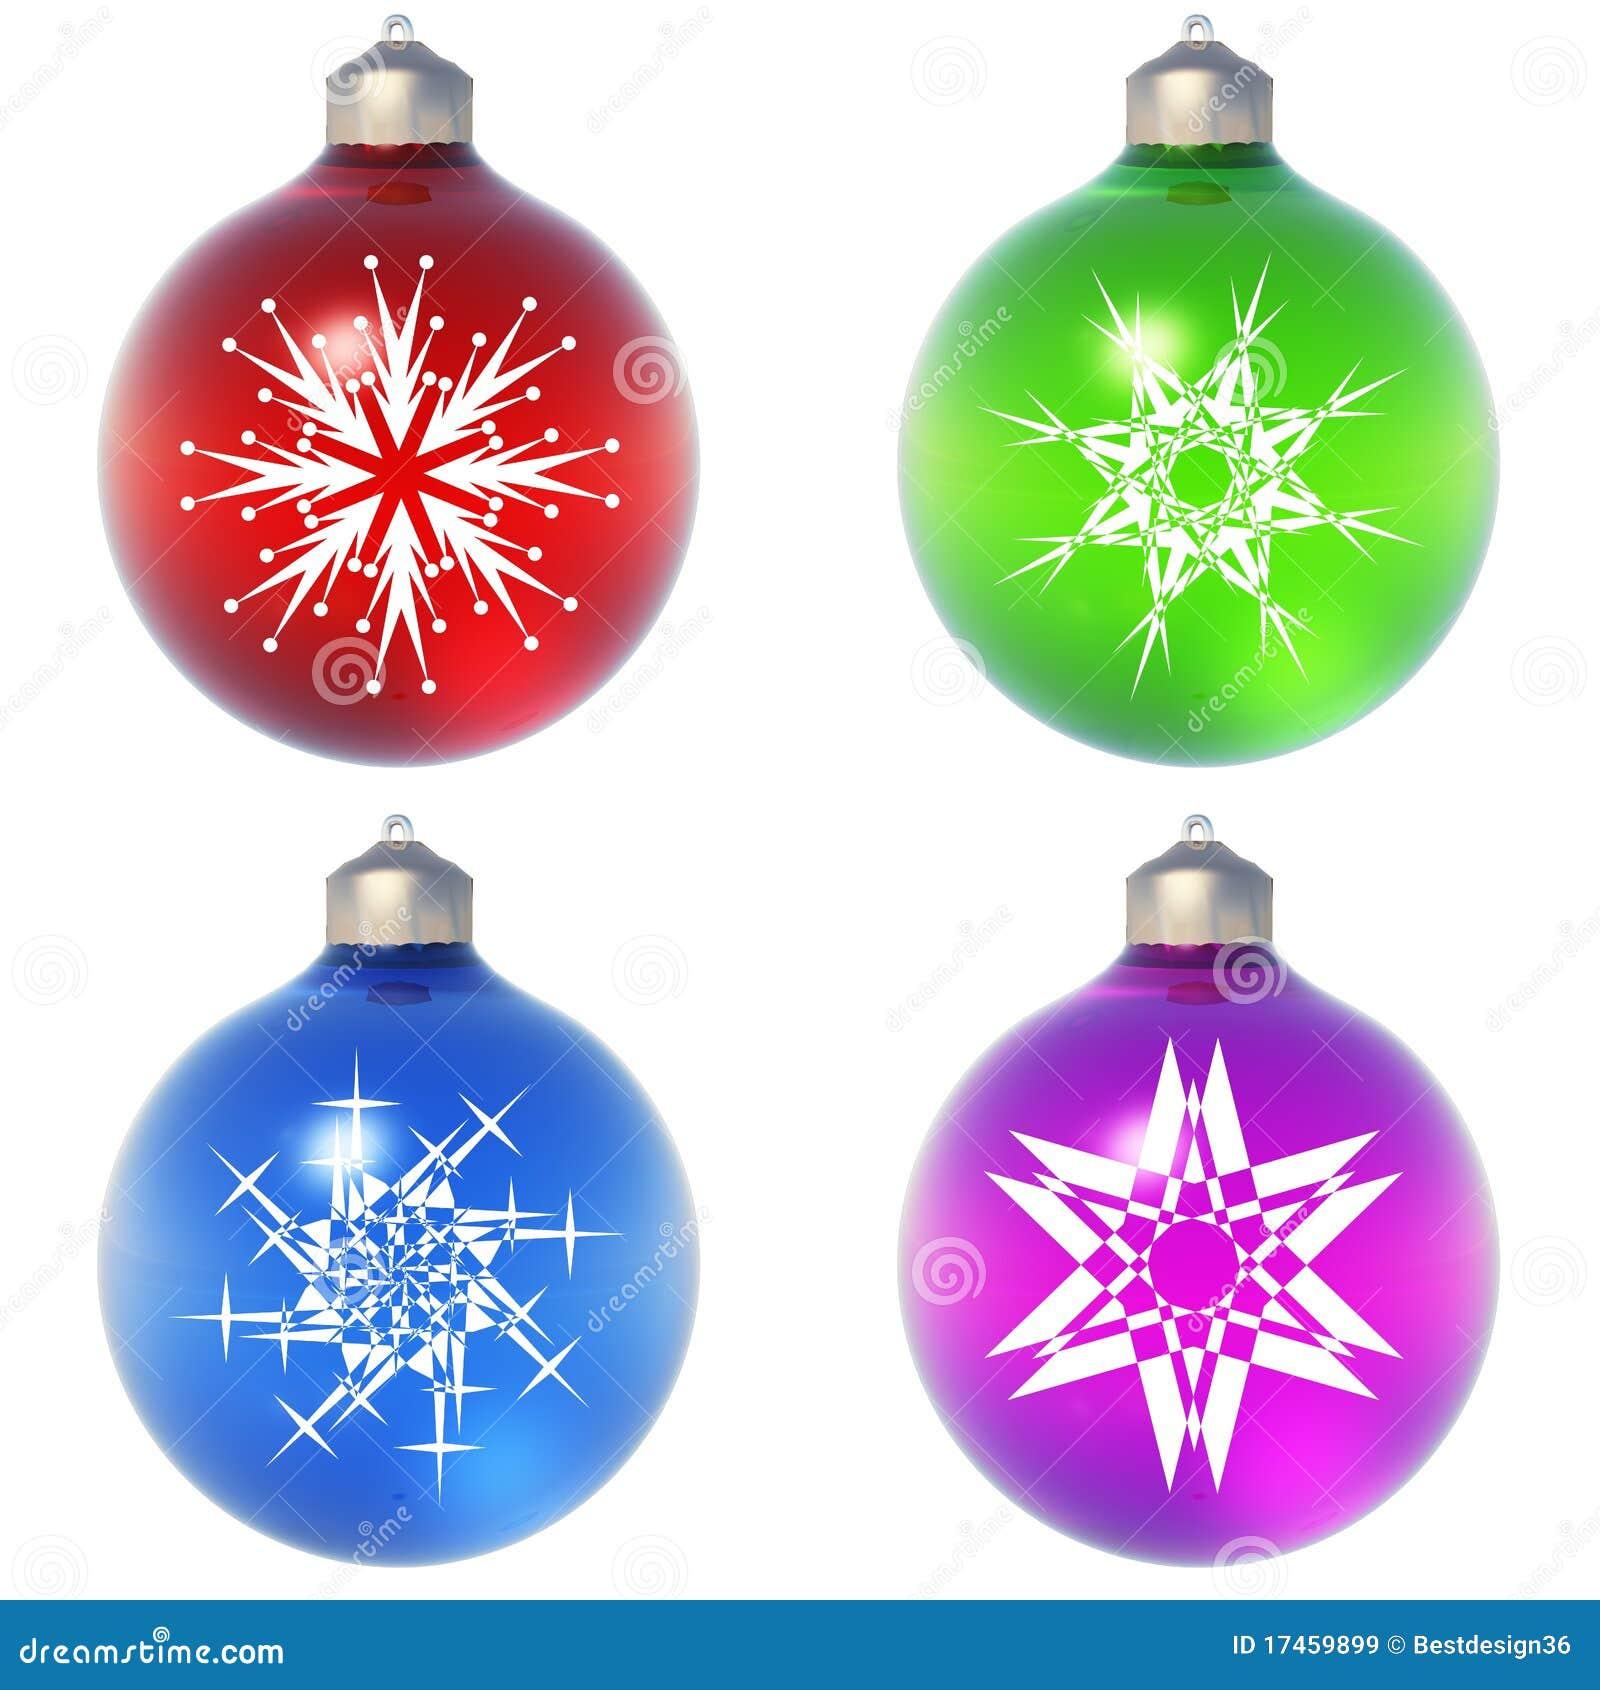 High resolution christmas ornament royalty free stock